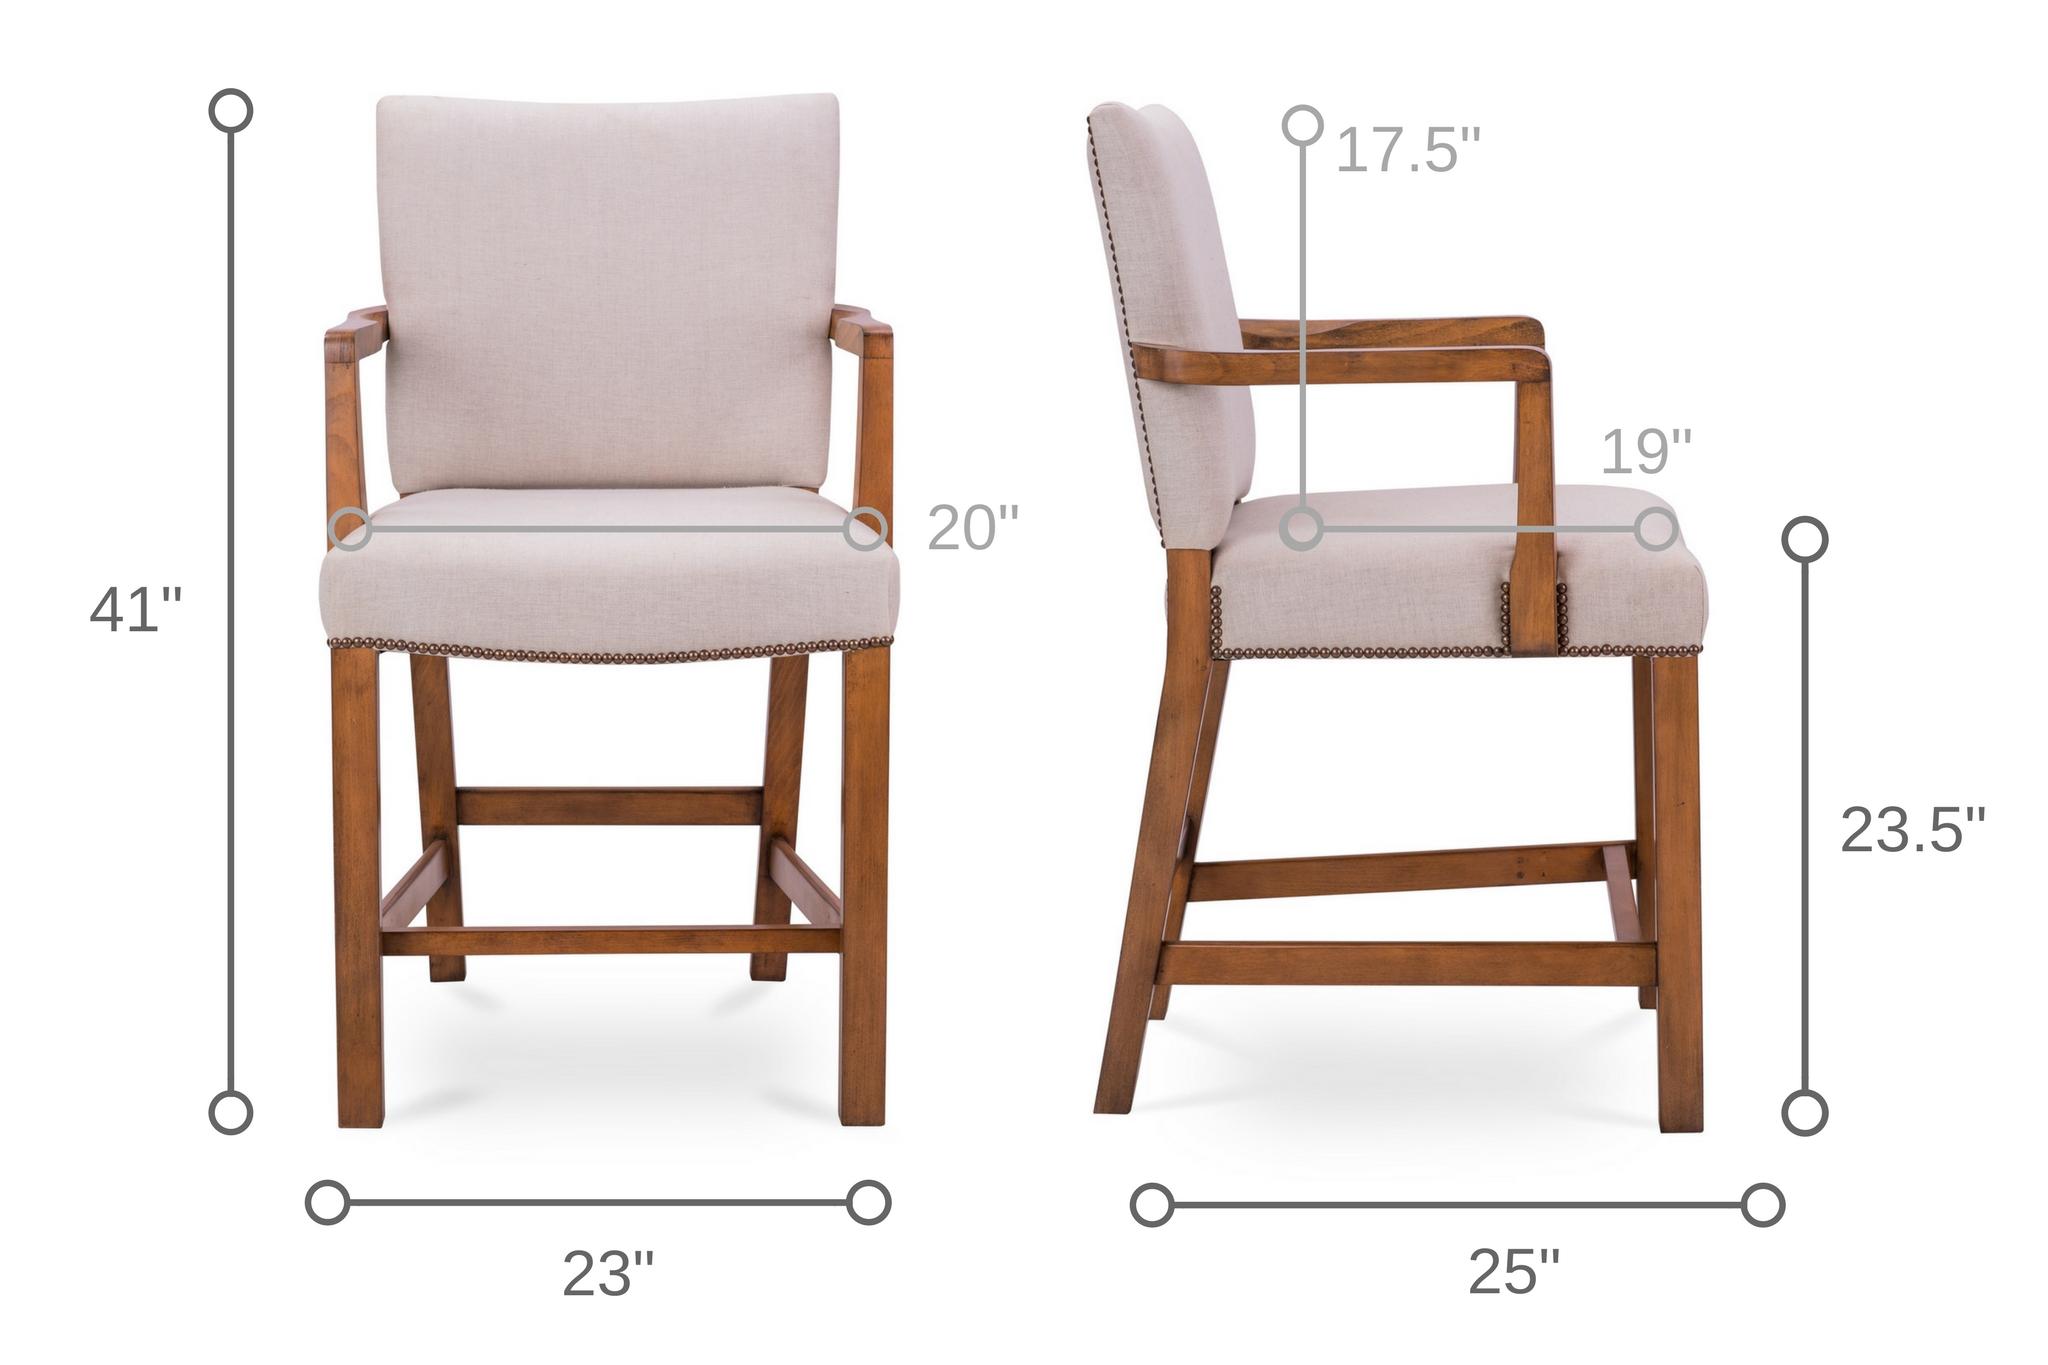 dowel furniture robert upholstered counter stool dimensions